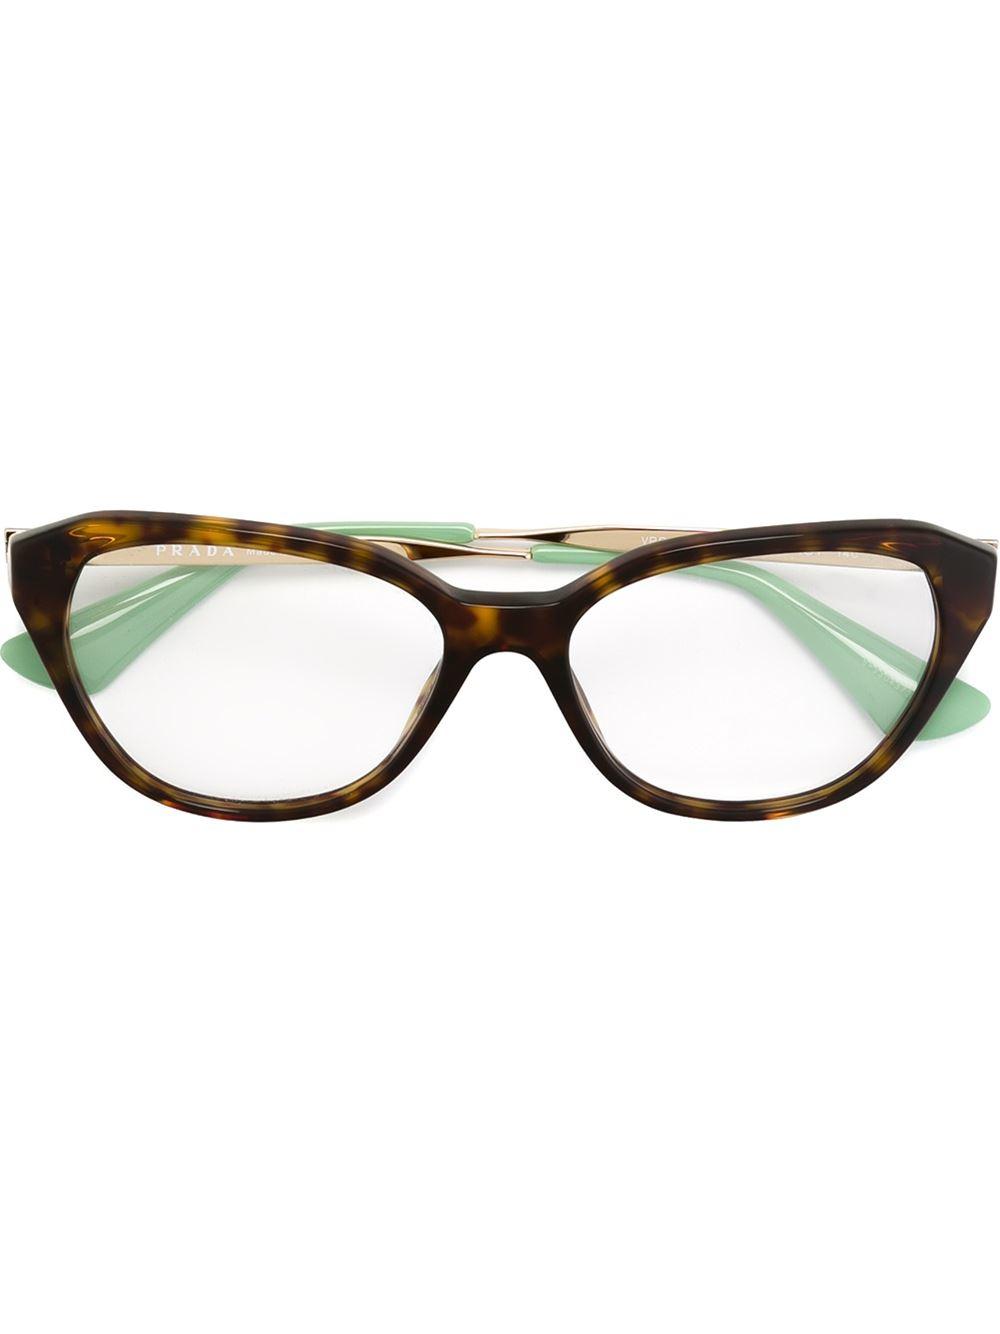 Prada Eyeglass Frames Cateye : Prada Cat Eye Glasses in Brown Lyst